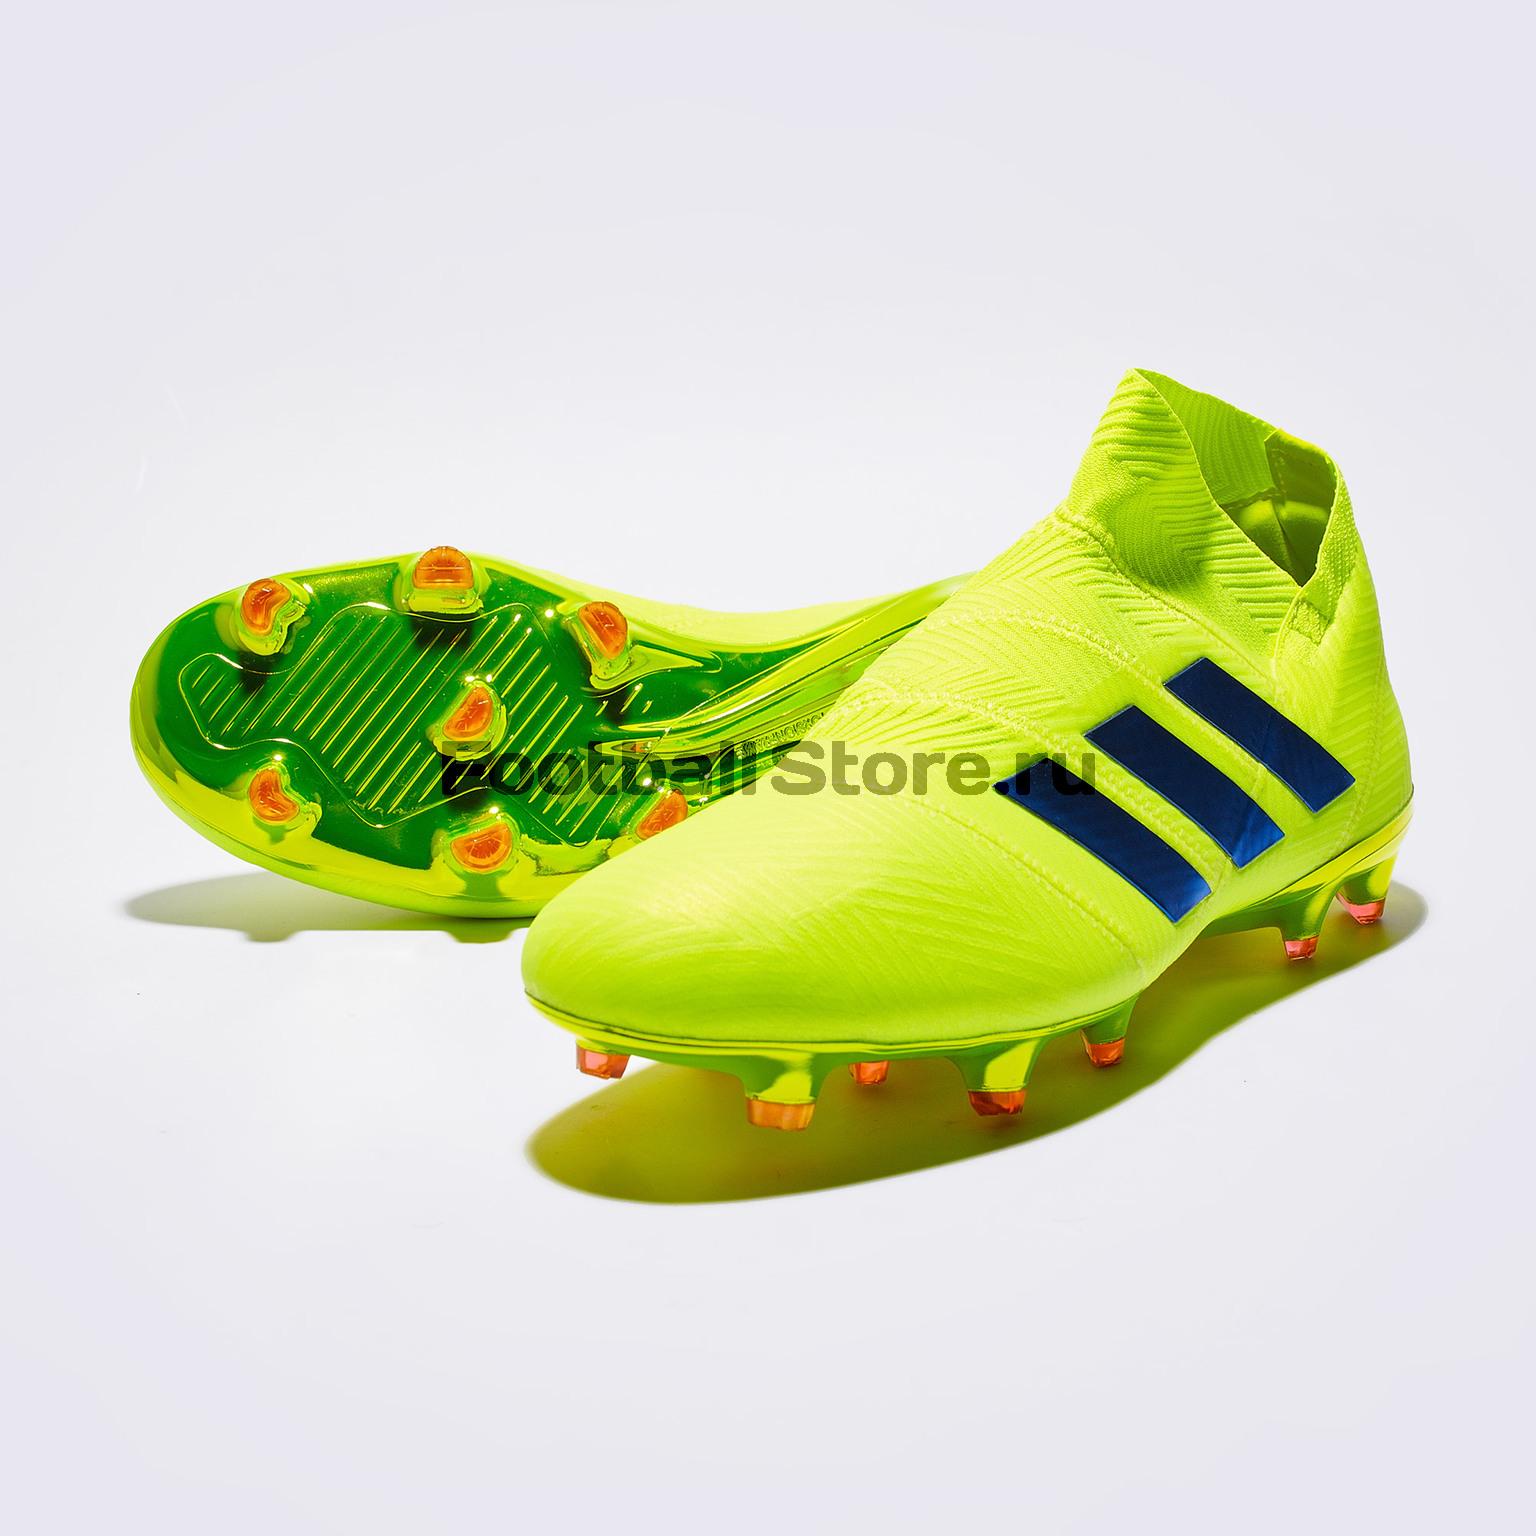 Бутсы Adidas Nemeziz 18 + FG BB9420 бутсы adidas messi 16 1 fg jr bb3852